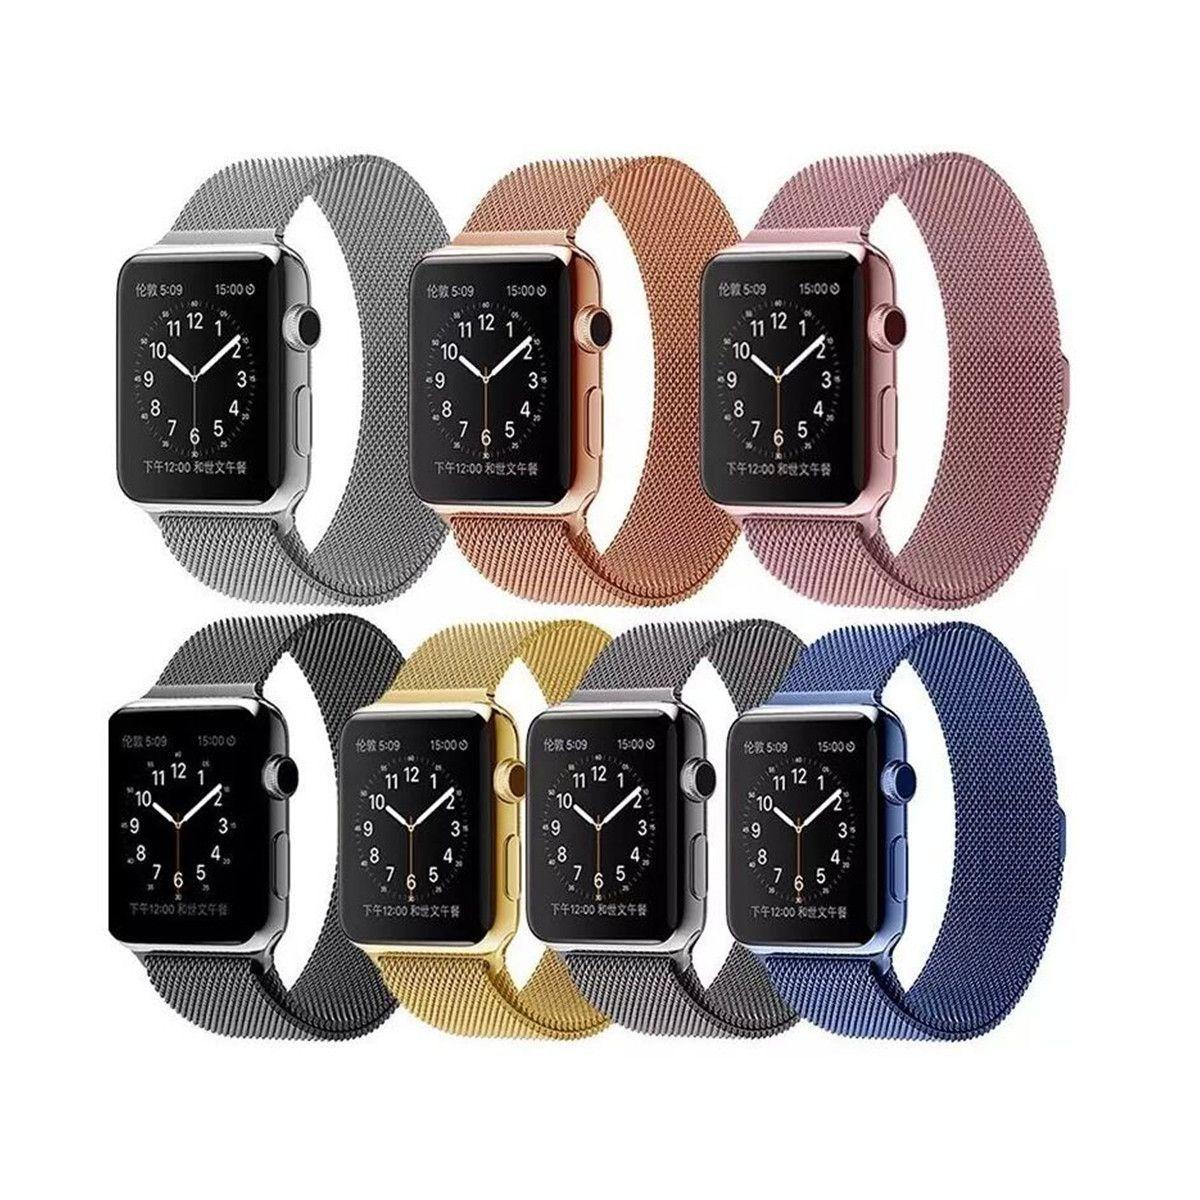 Luxury Milanese Loop Strap & Link Bracelet Stainless Steel Band Adjustable Closure for Apple Watch 42mm 38mm